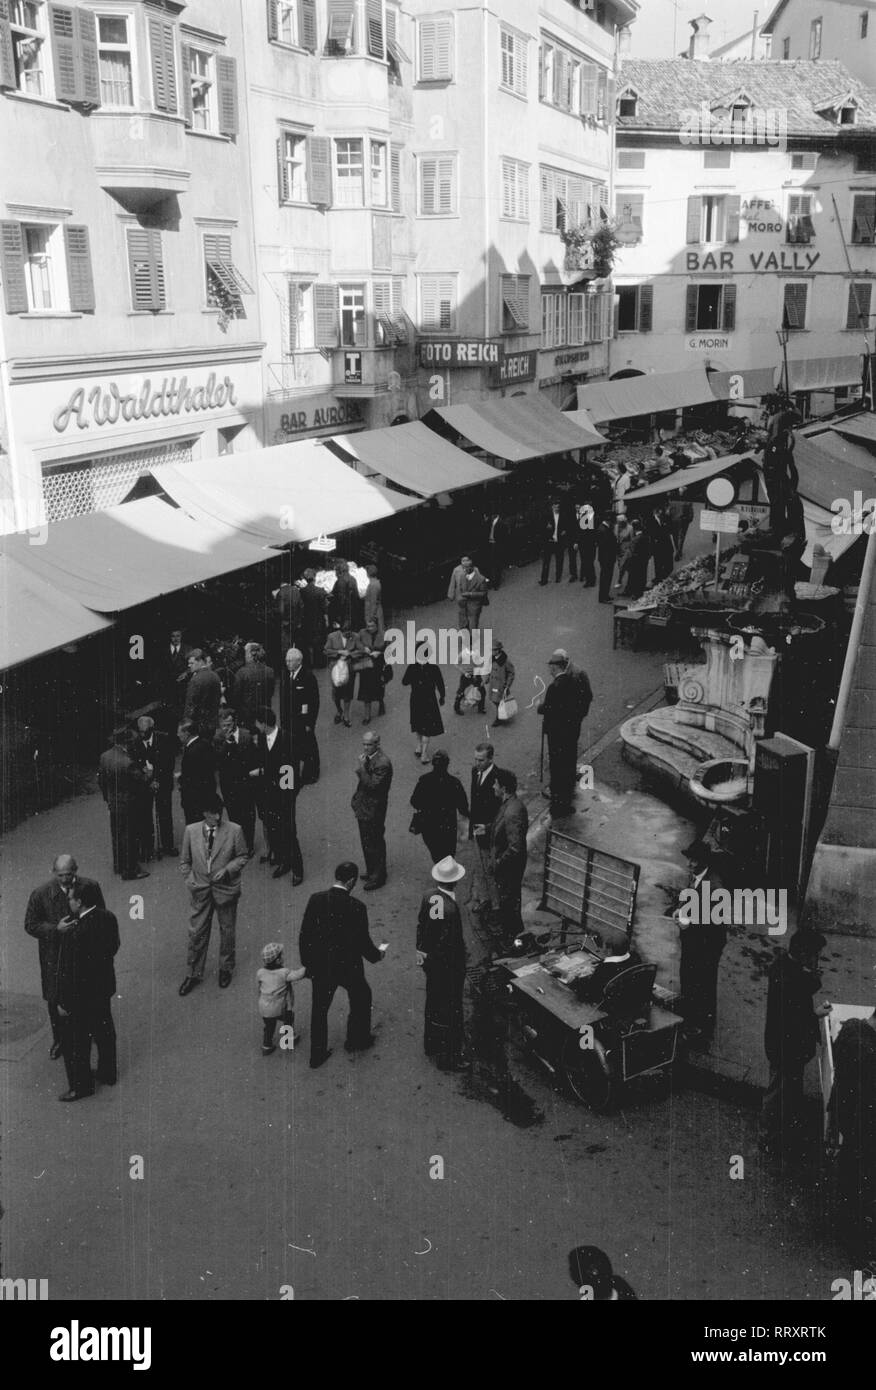 Italien - Fruit market in Bozen, 1950. Photo by Erich Andres Italy, Italia, Bozen, Bolzano, South Tyrol, Alto Adige, travel, viaggio, 1950, market, mercato Südtirol ca. 1950, Obstmarkt in Bozen - Stock Image